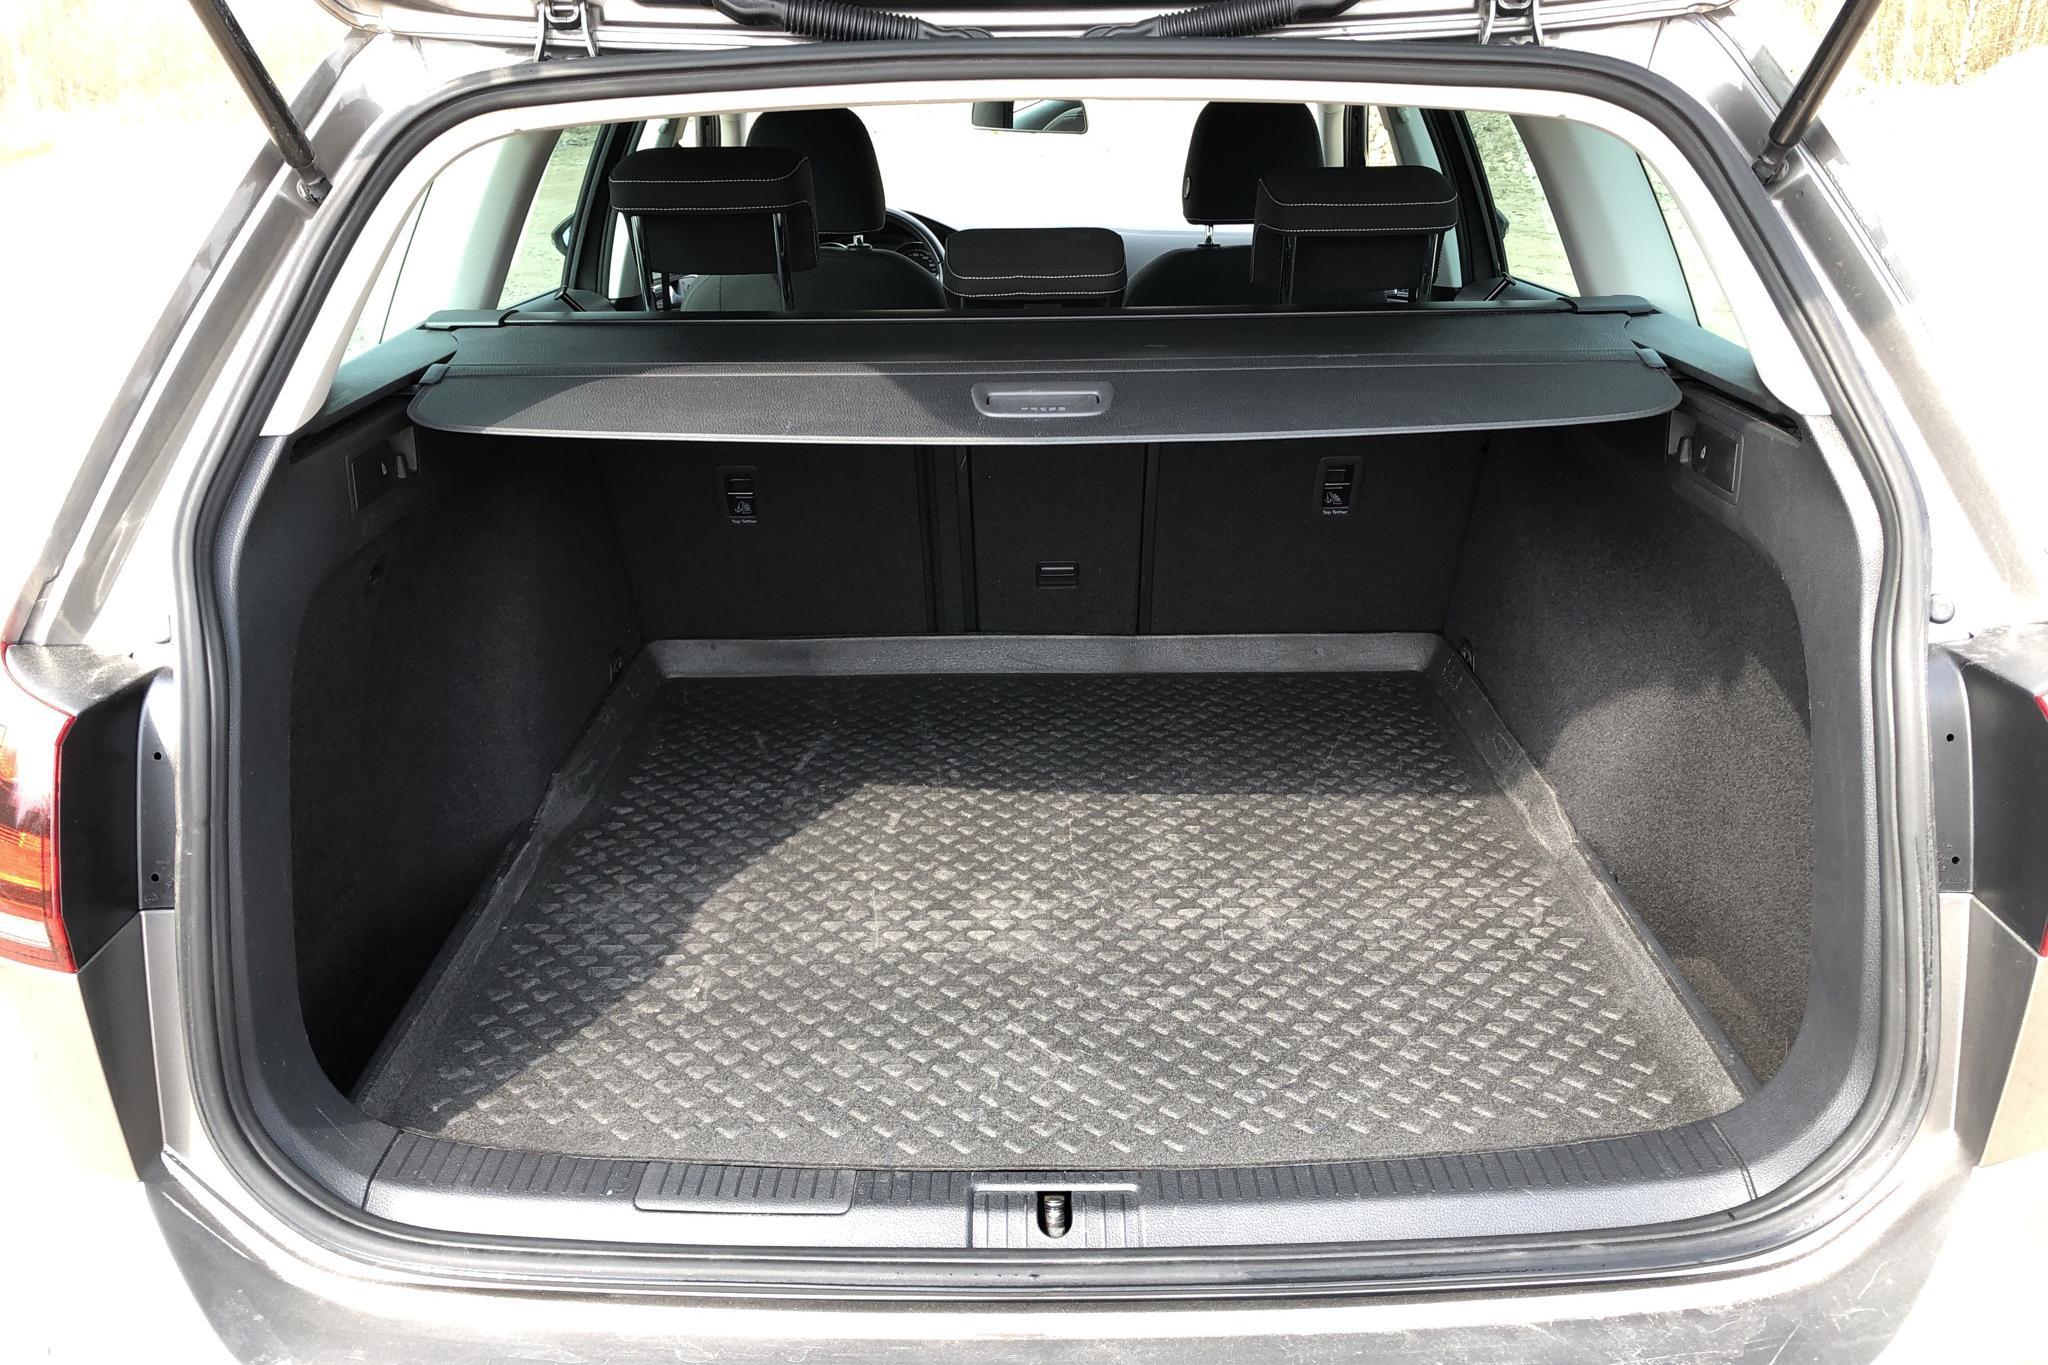 VW Golf VII 1.4 TSI Sportscombi (140hk) - 136 050 km - Manual - gray - 2014